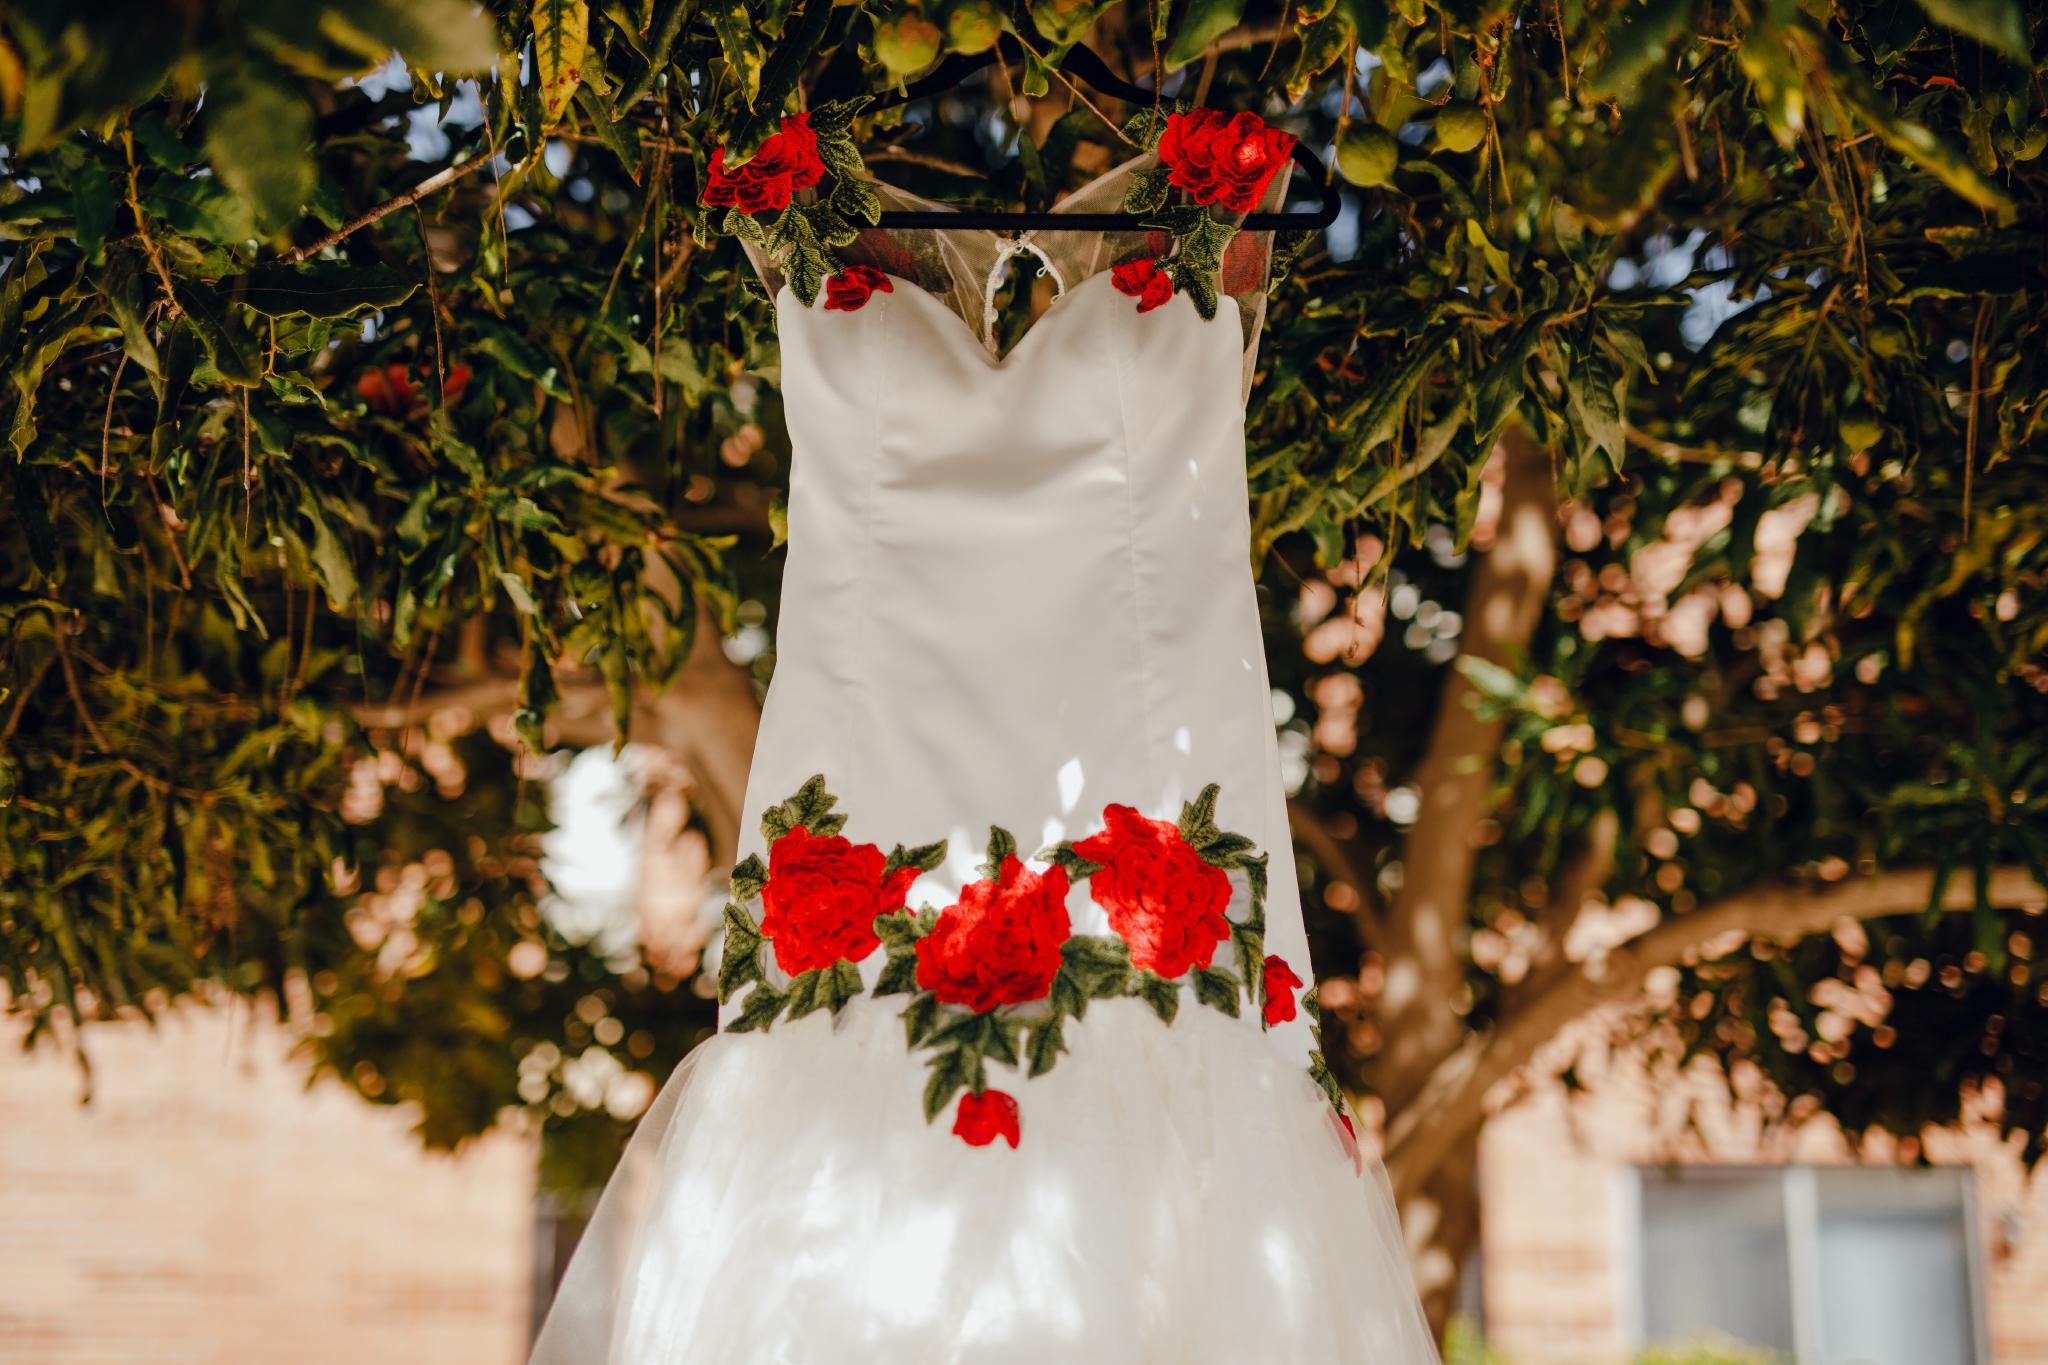 San Diego Wedding Photographer | Mexican inspired wedding dress